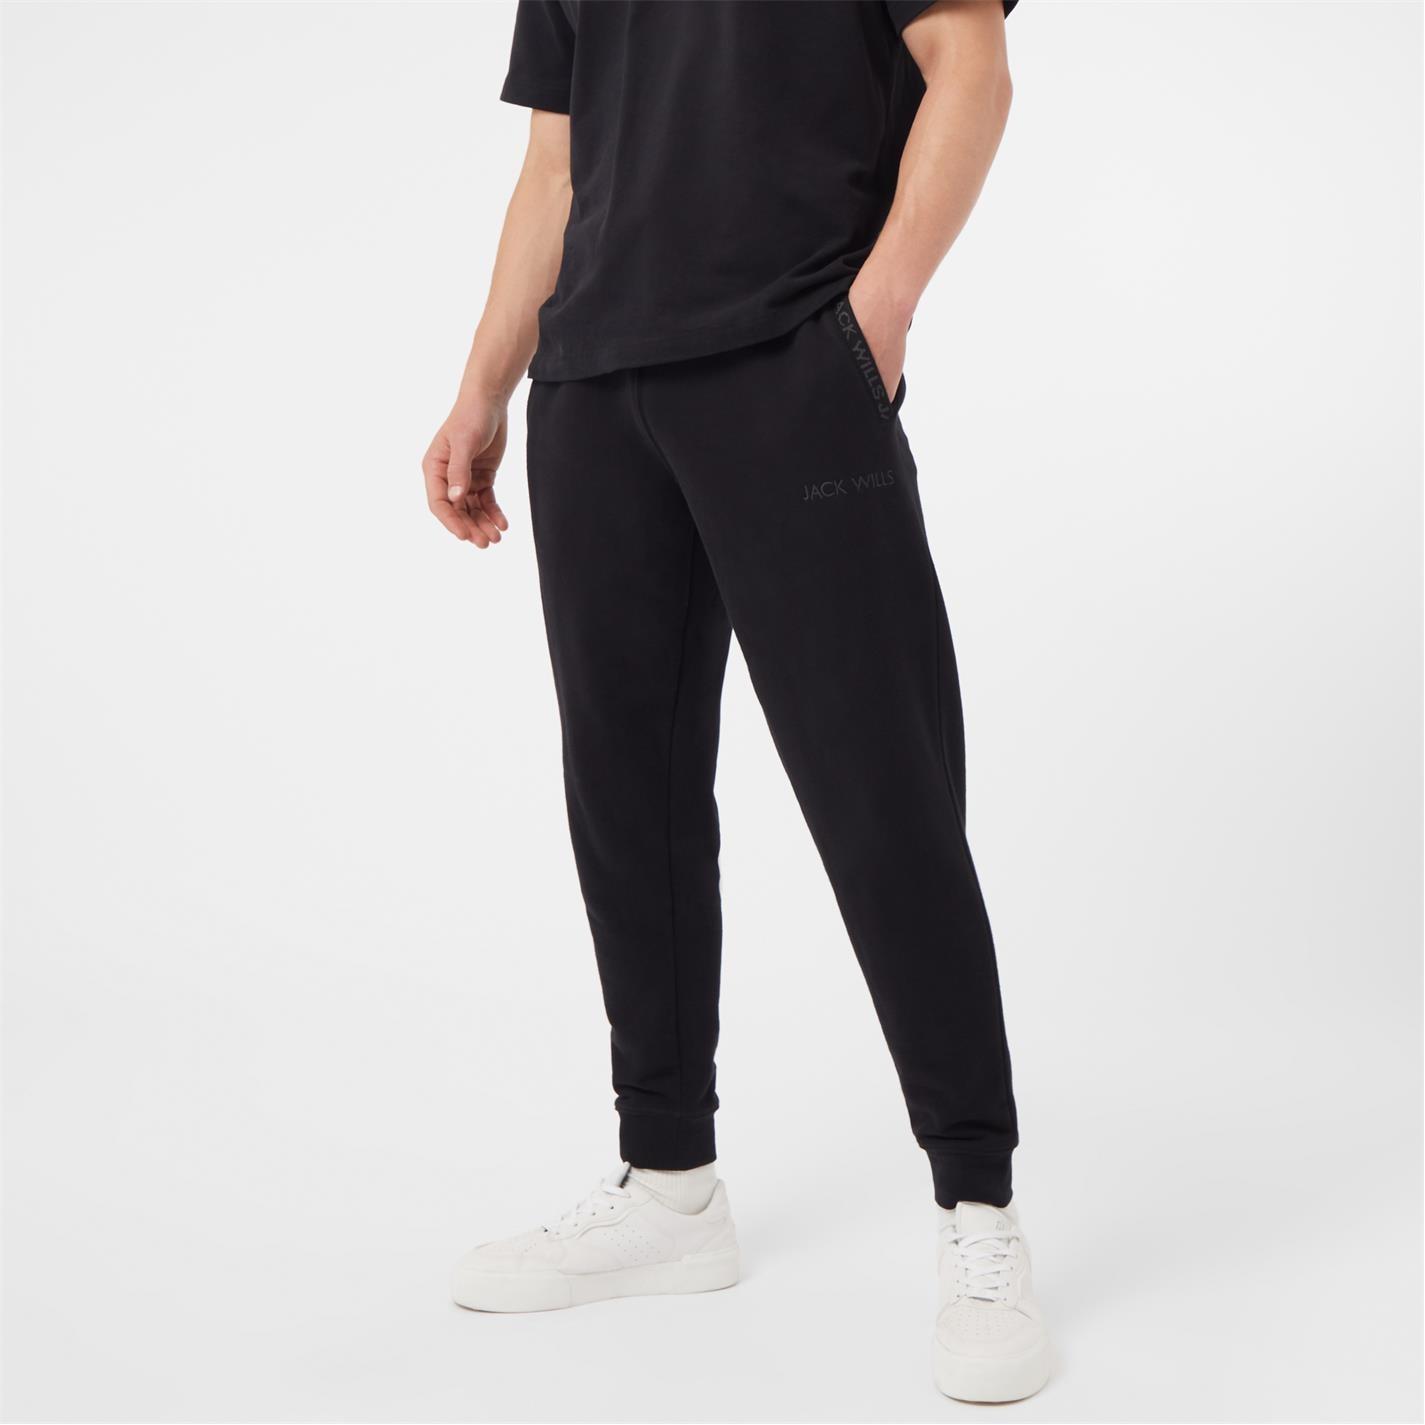 Pantaloni jogging Jack Wills Jacquard negru